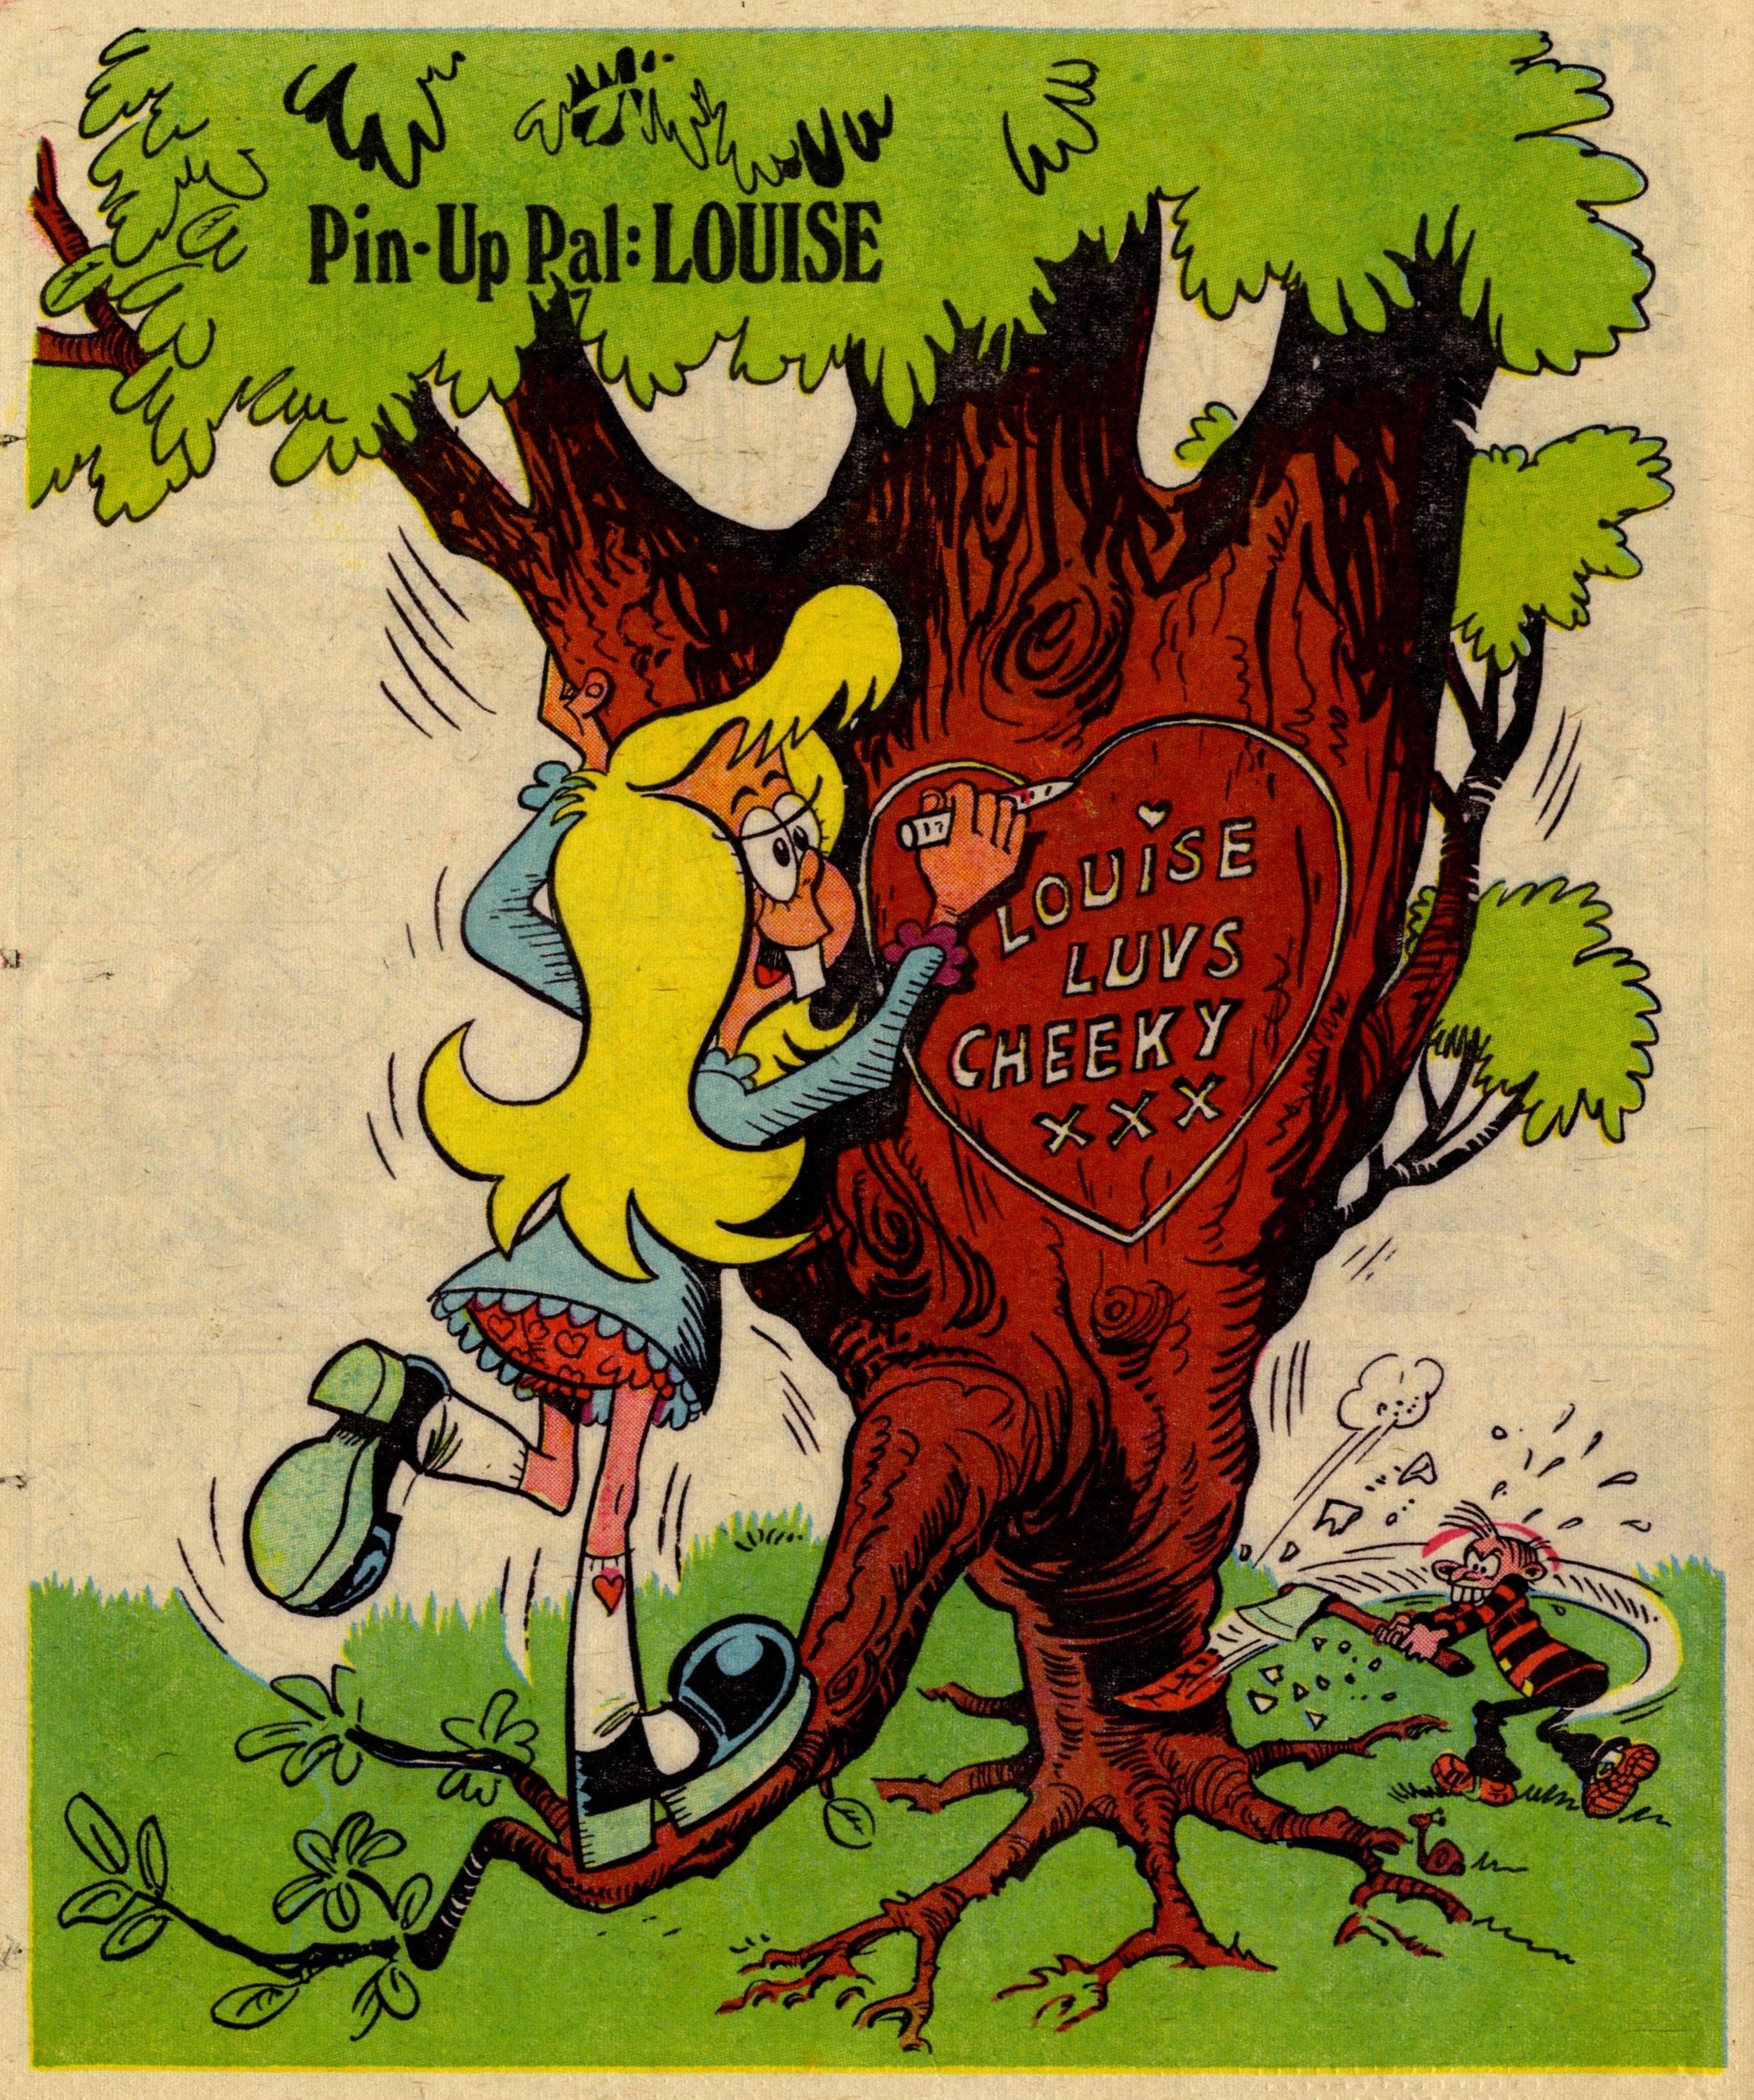 Pin-up Pal: Louise (artist Frank McDiarmid), 15 April 1978